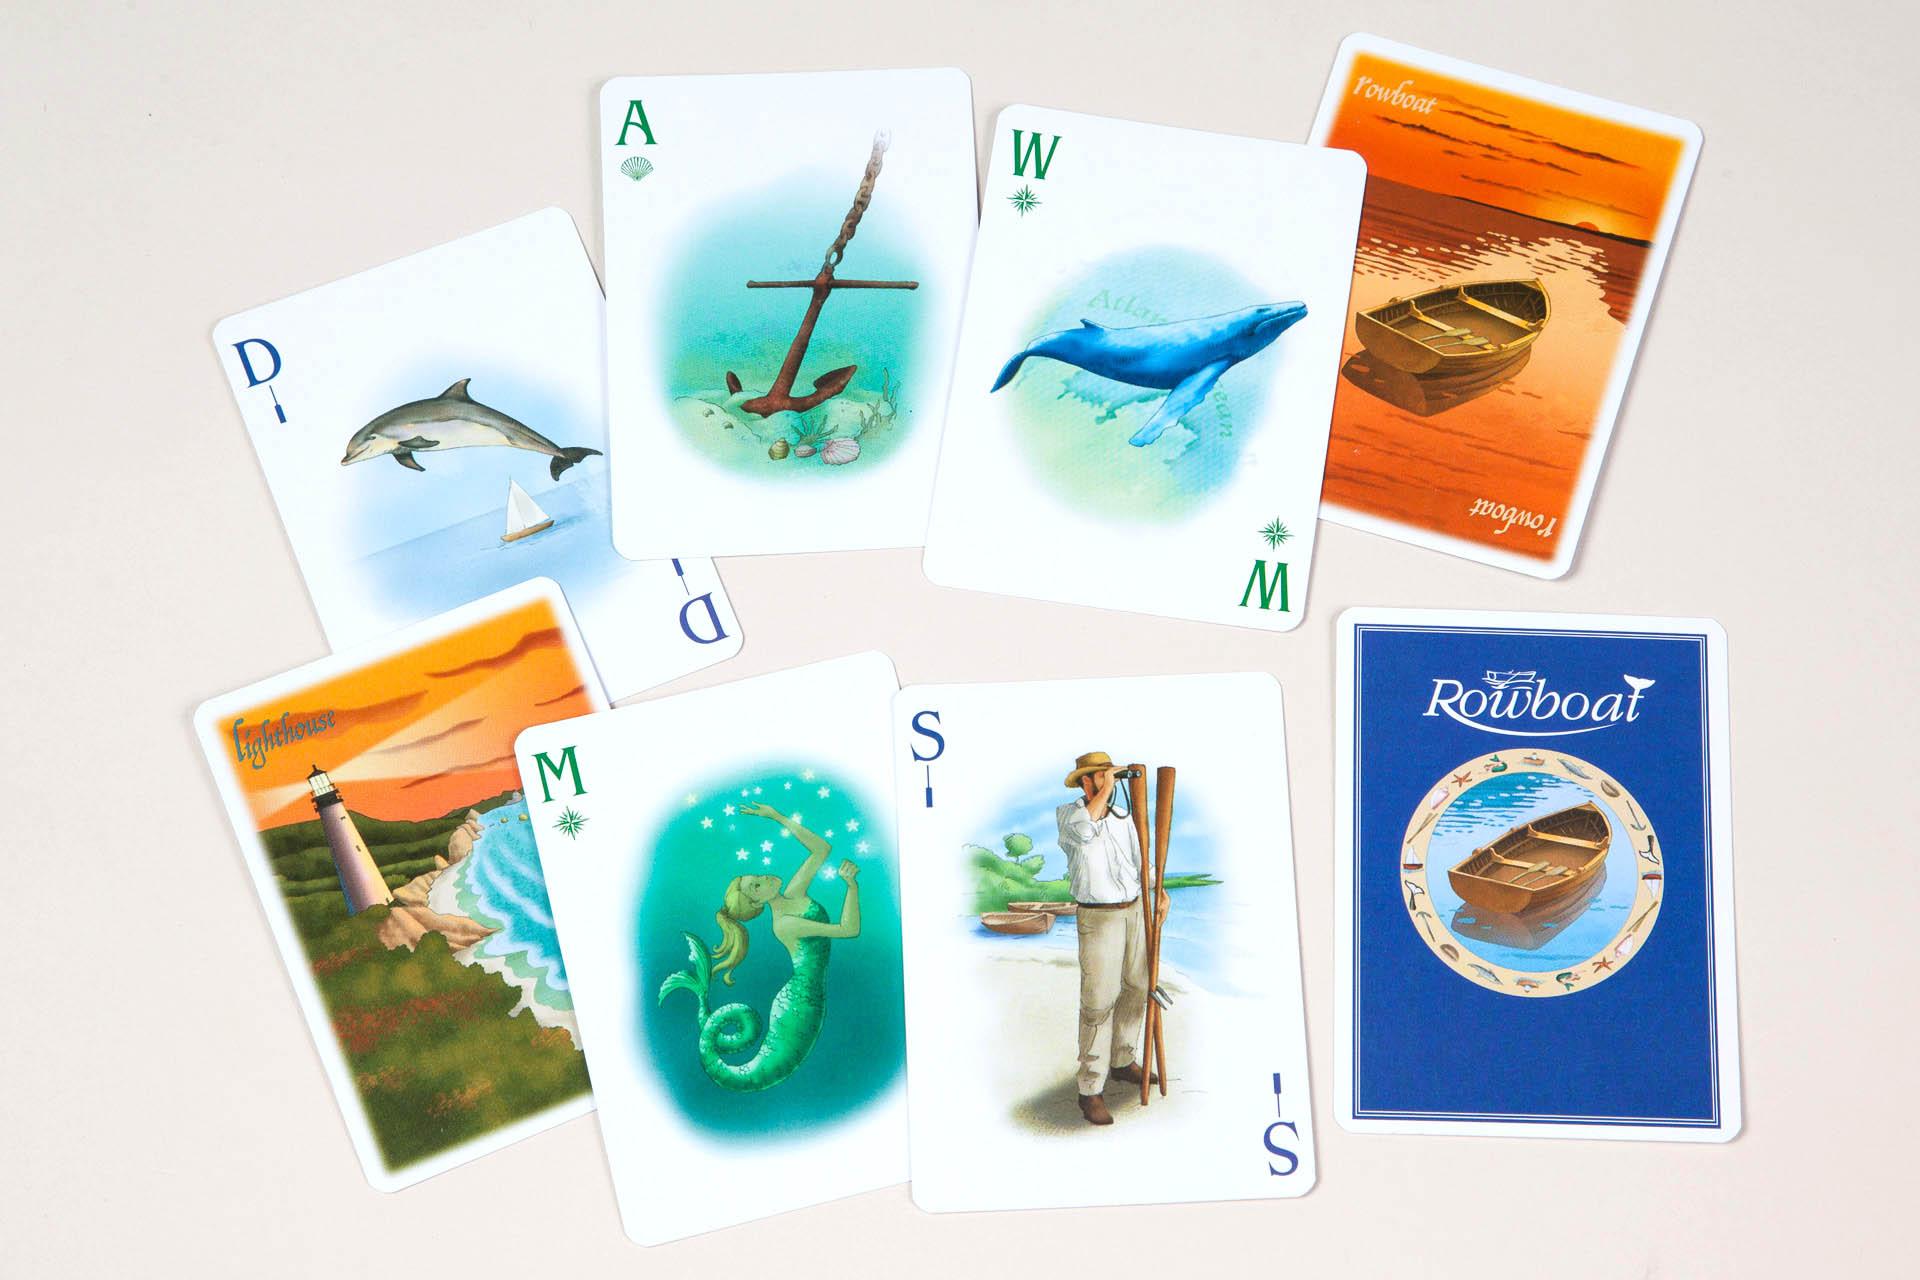 Rowboat card game illustrations • Moostache Games